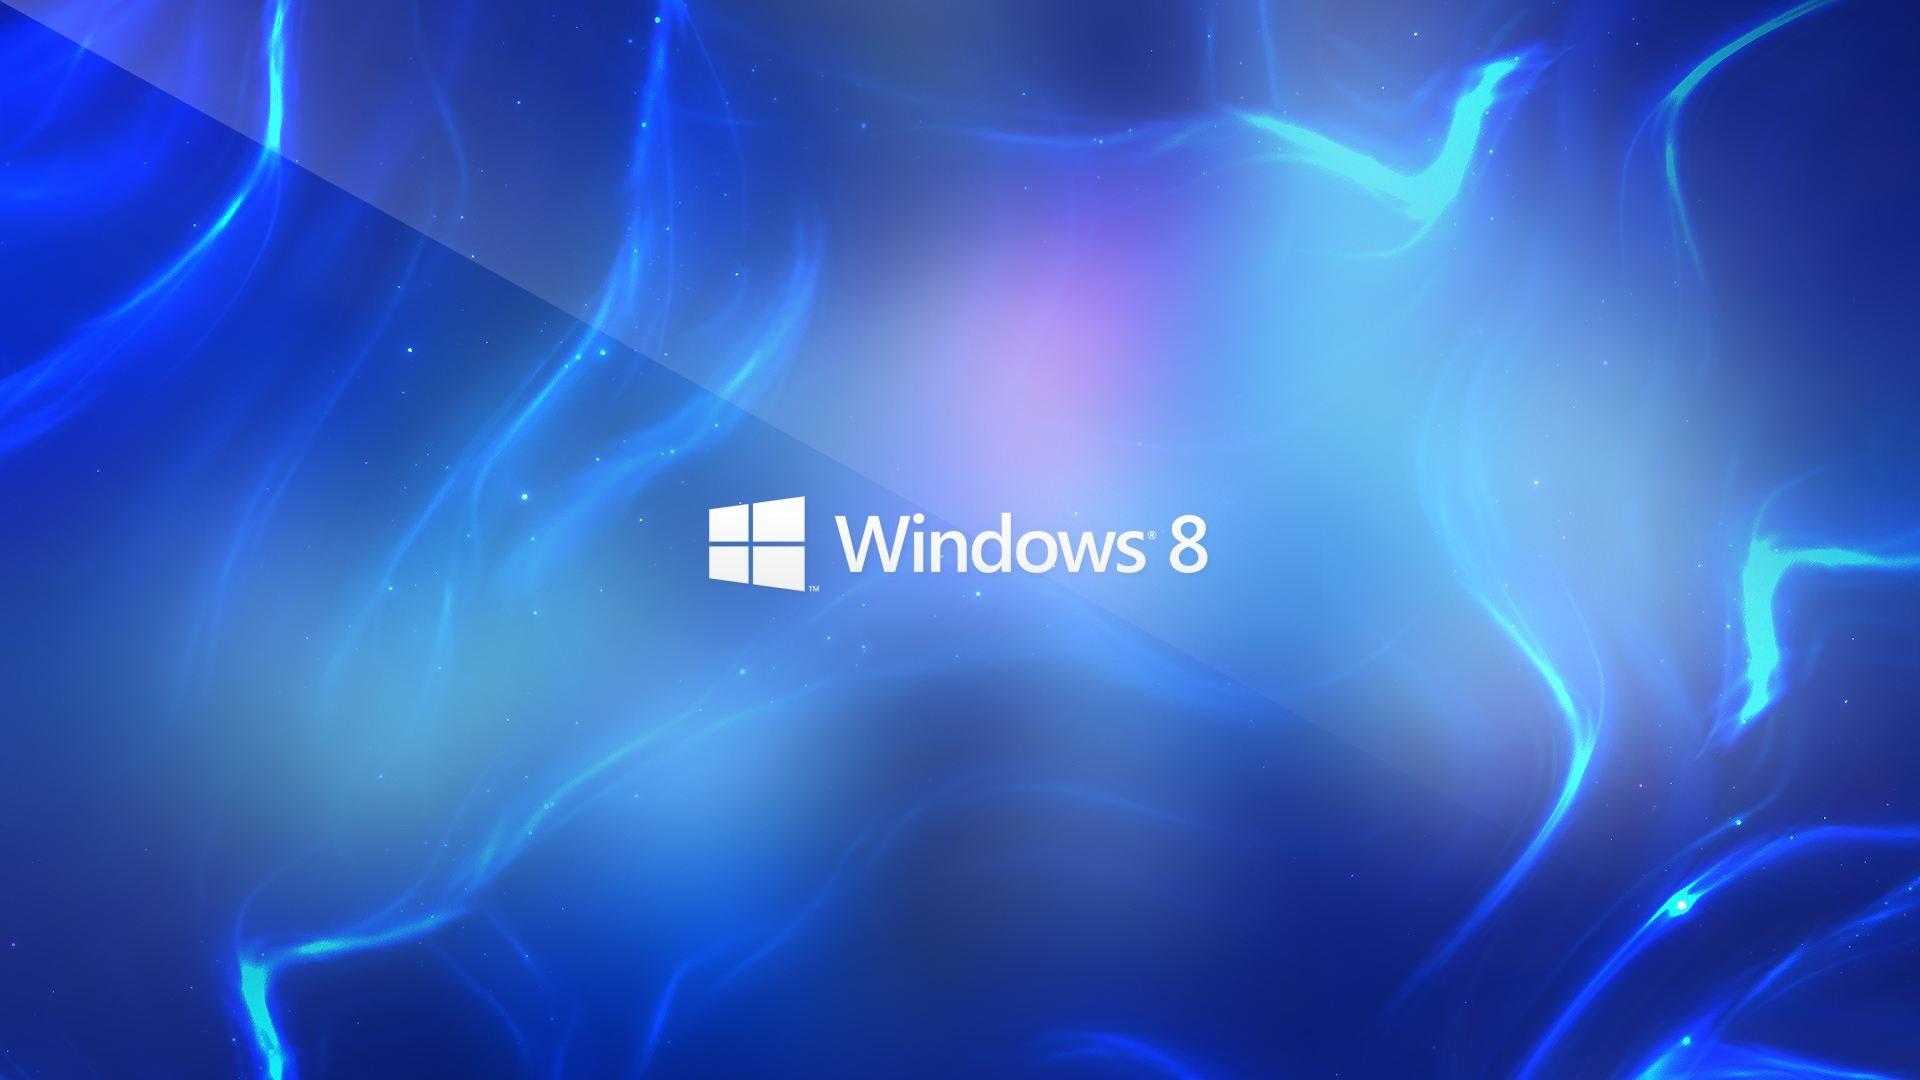 Desktop Wallpaper Hd Microsoft Windows 81 HD 1920x1080